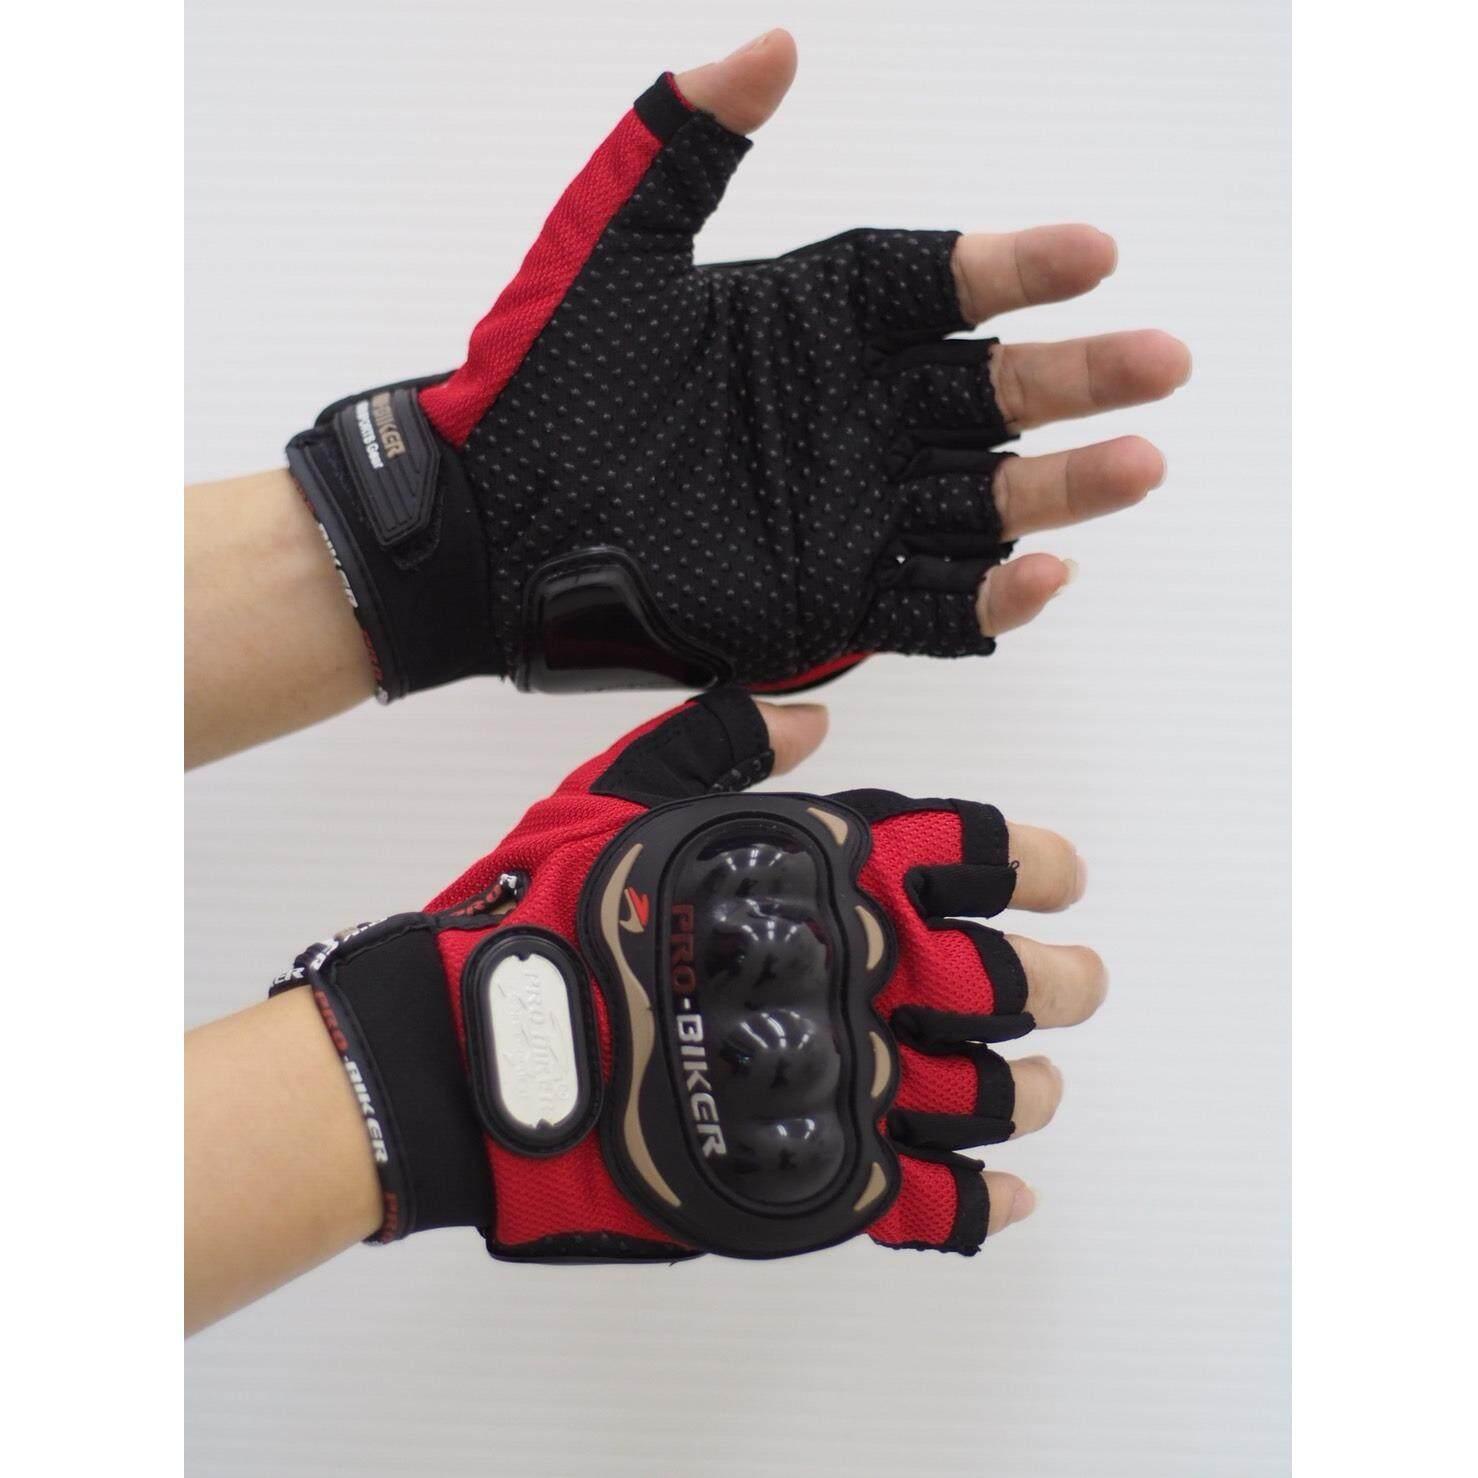 Probiker Mcs-04 ถุงมือครึ่งนิ้ว(สีดำ/แดง/น้ำเงิน) ลิขสิทธิ์แท้100%ถูกที่สุดในโลก.